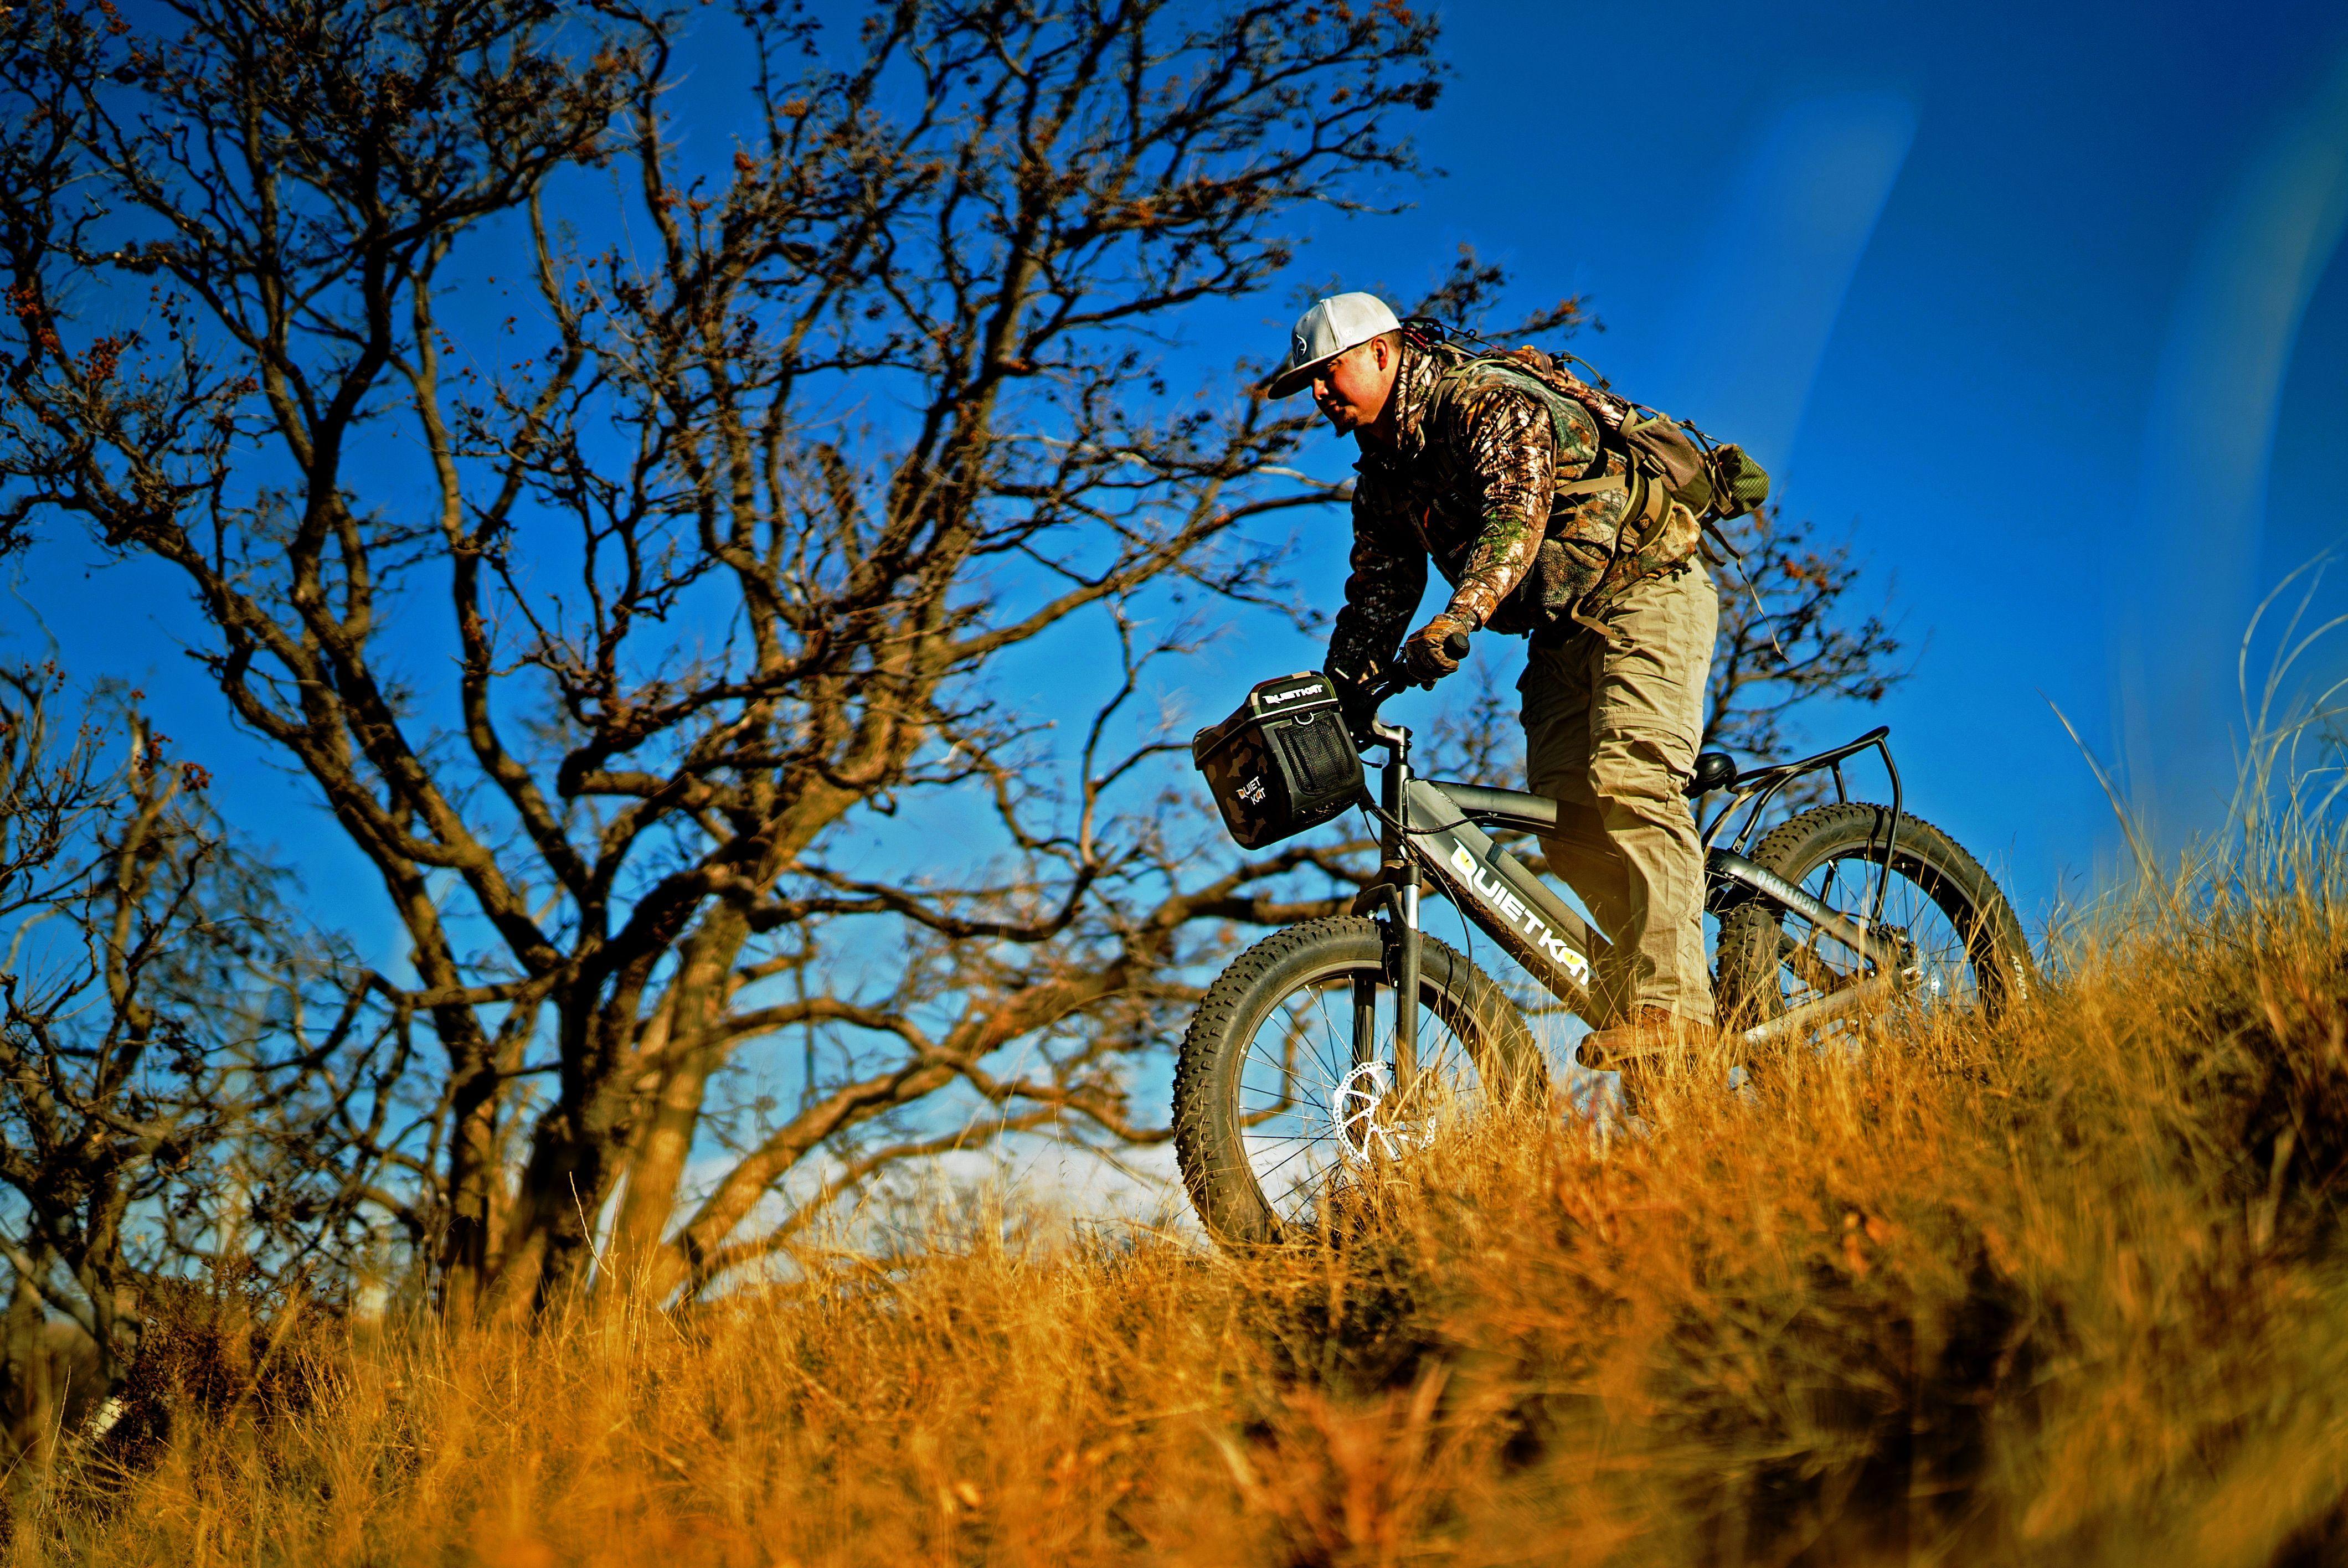 Quietkat Fatkat Warrior 1000 Watts Mountain Electric Bike Ebike